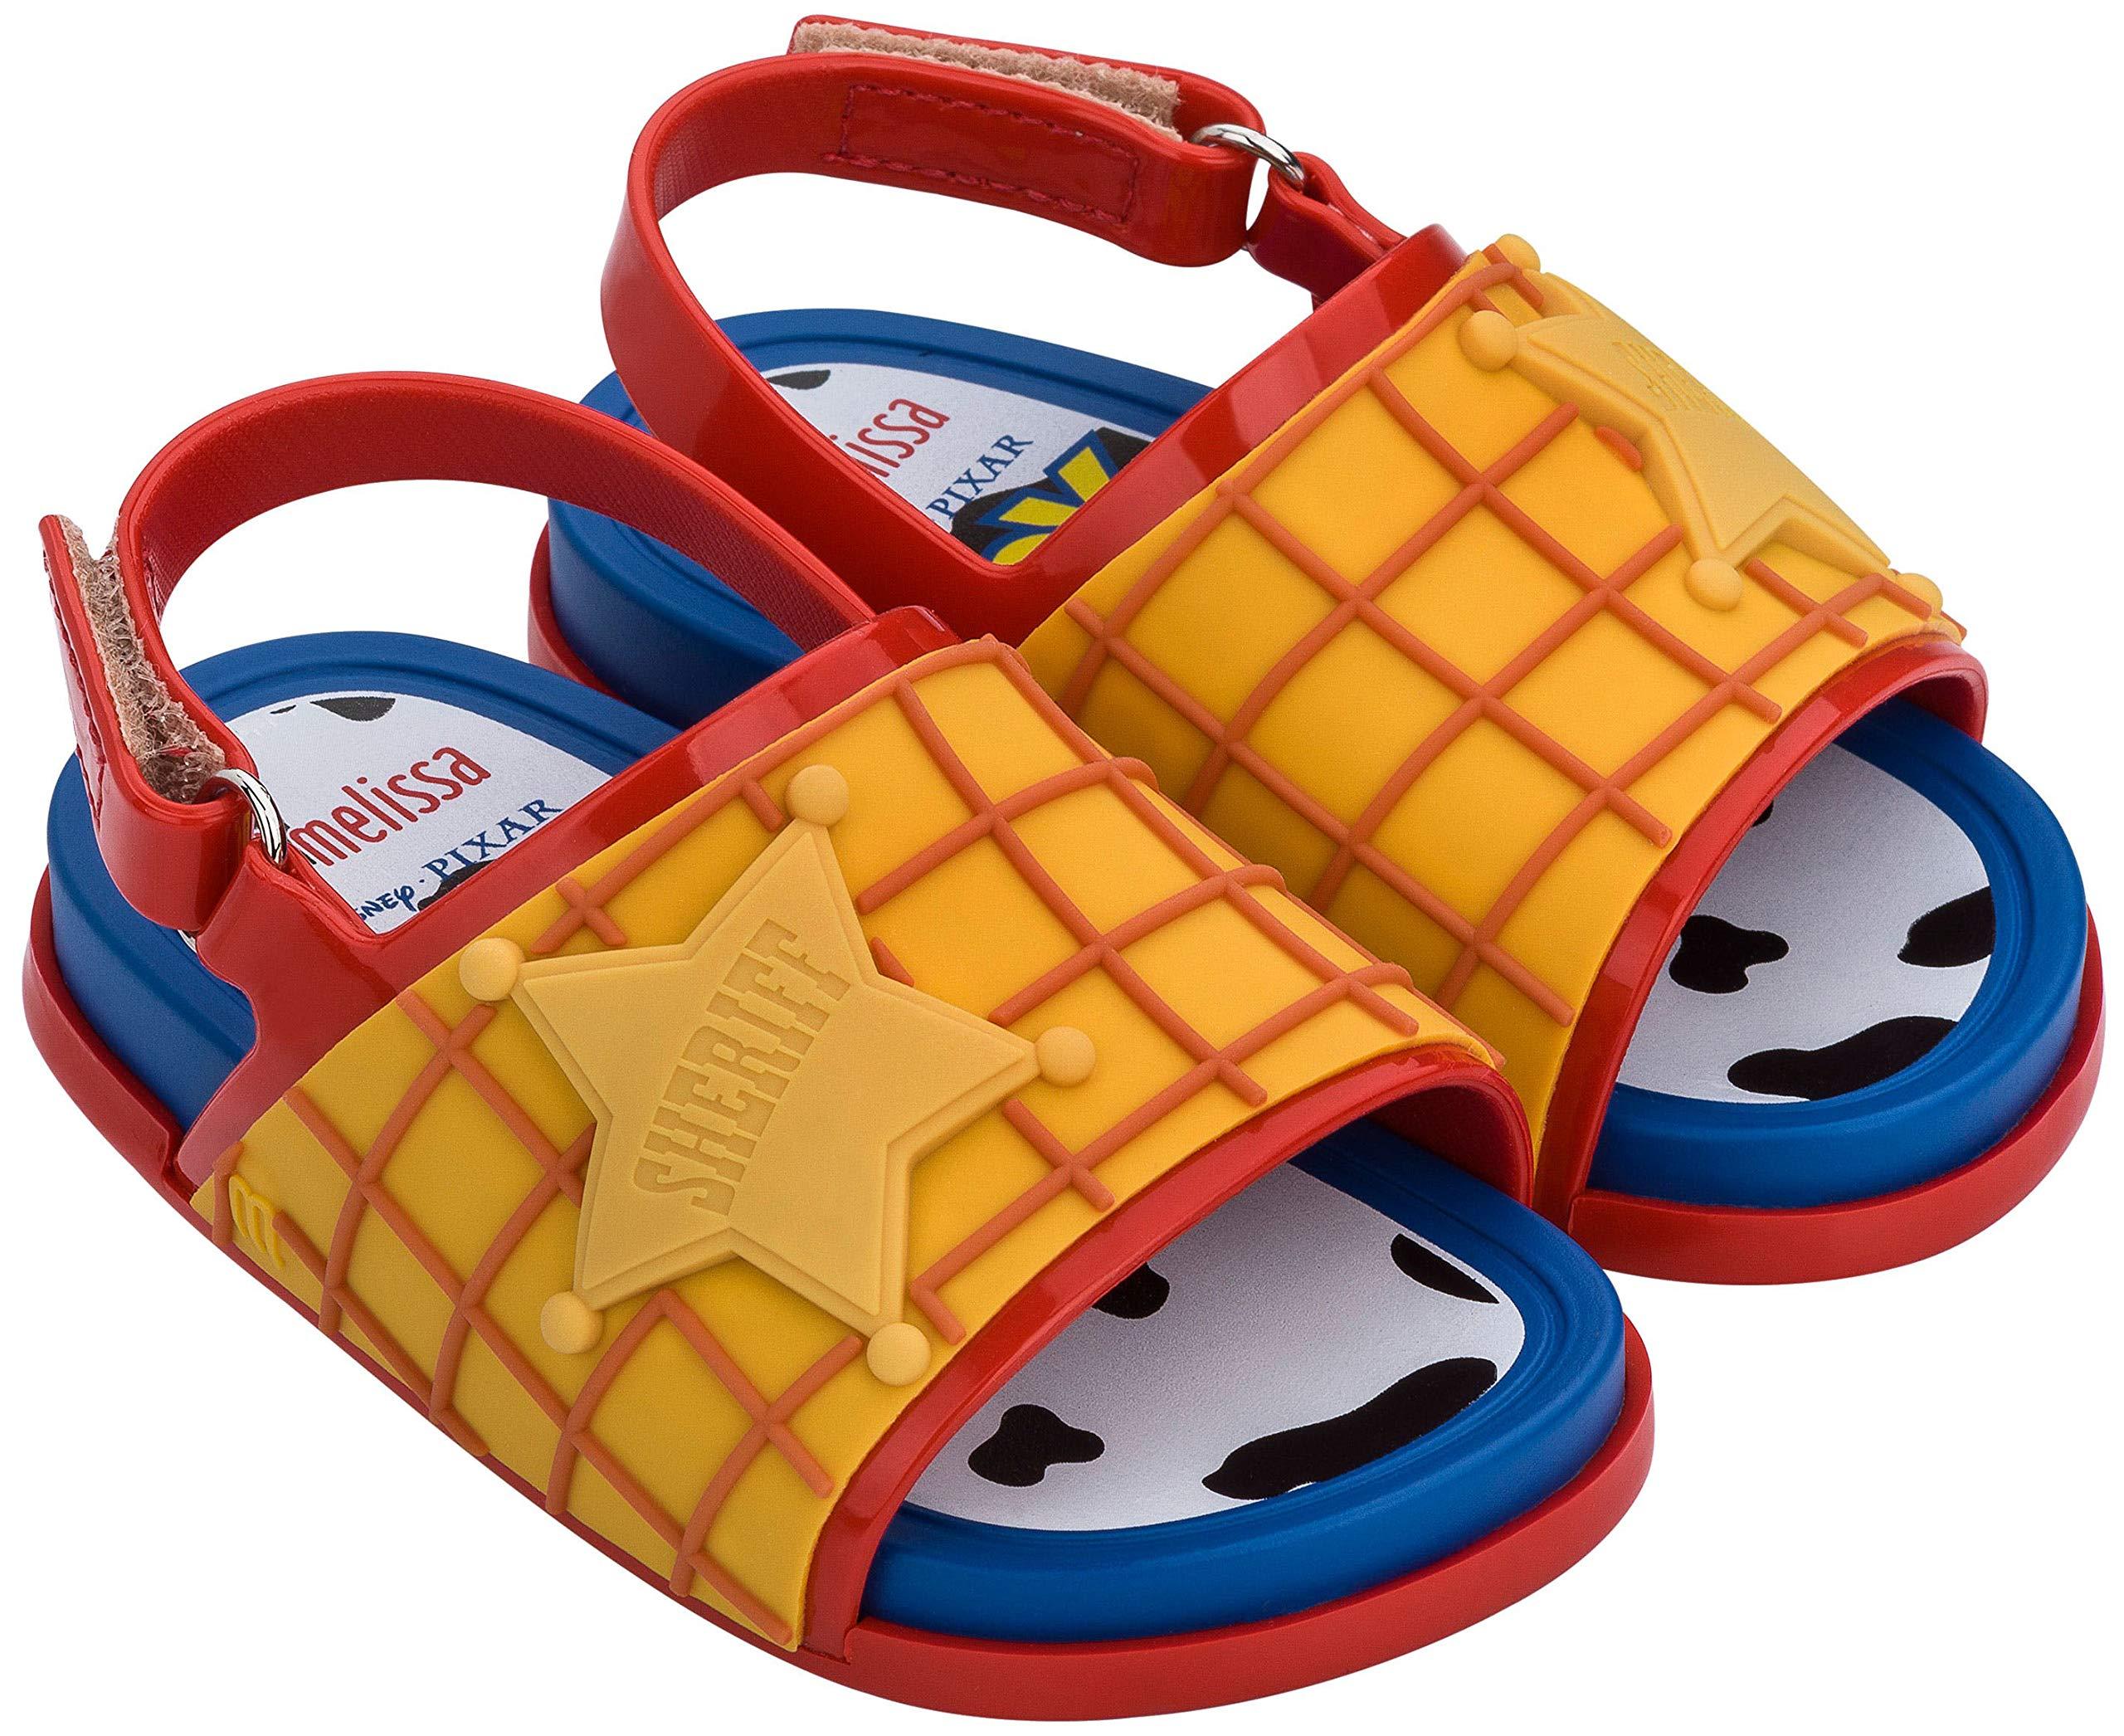 melissa 迷你沙滩拖鞋 + 玩具总动员凉鞋,红色蓝色,尺码 10 幼儿